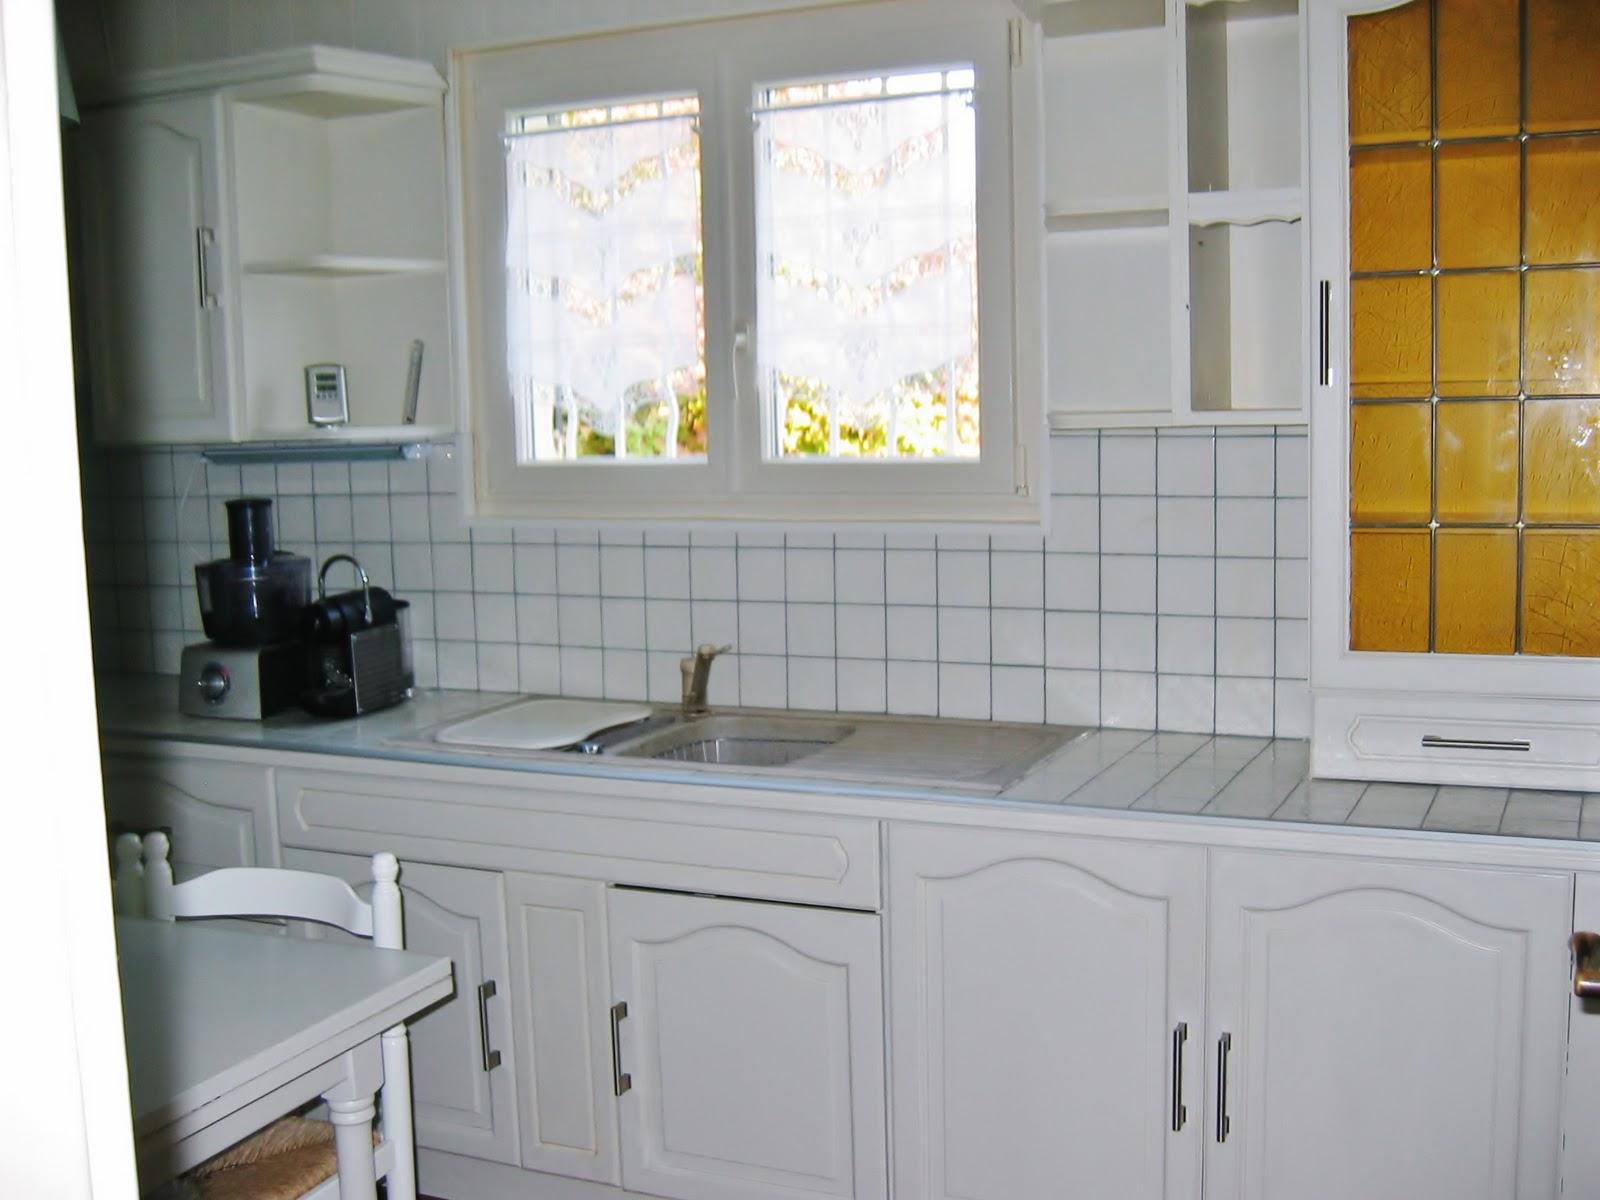 L 39 Atelier D Co Du Capagut La Cuisine De Jean Bernard